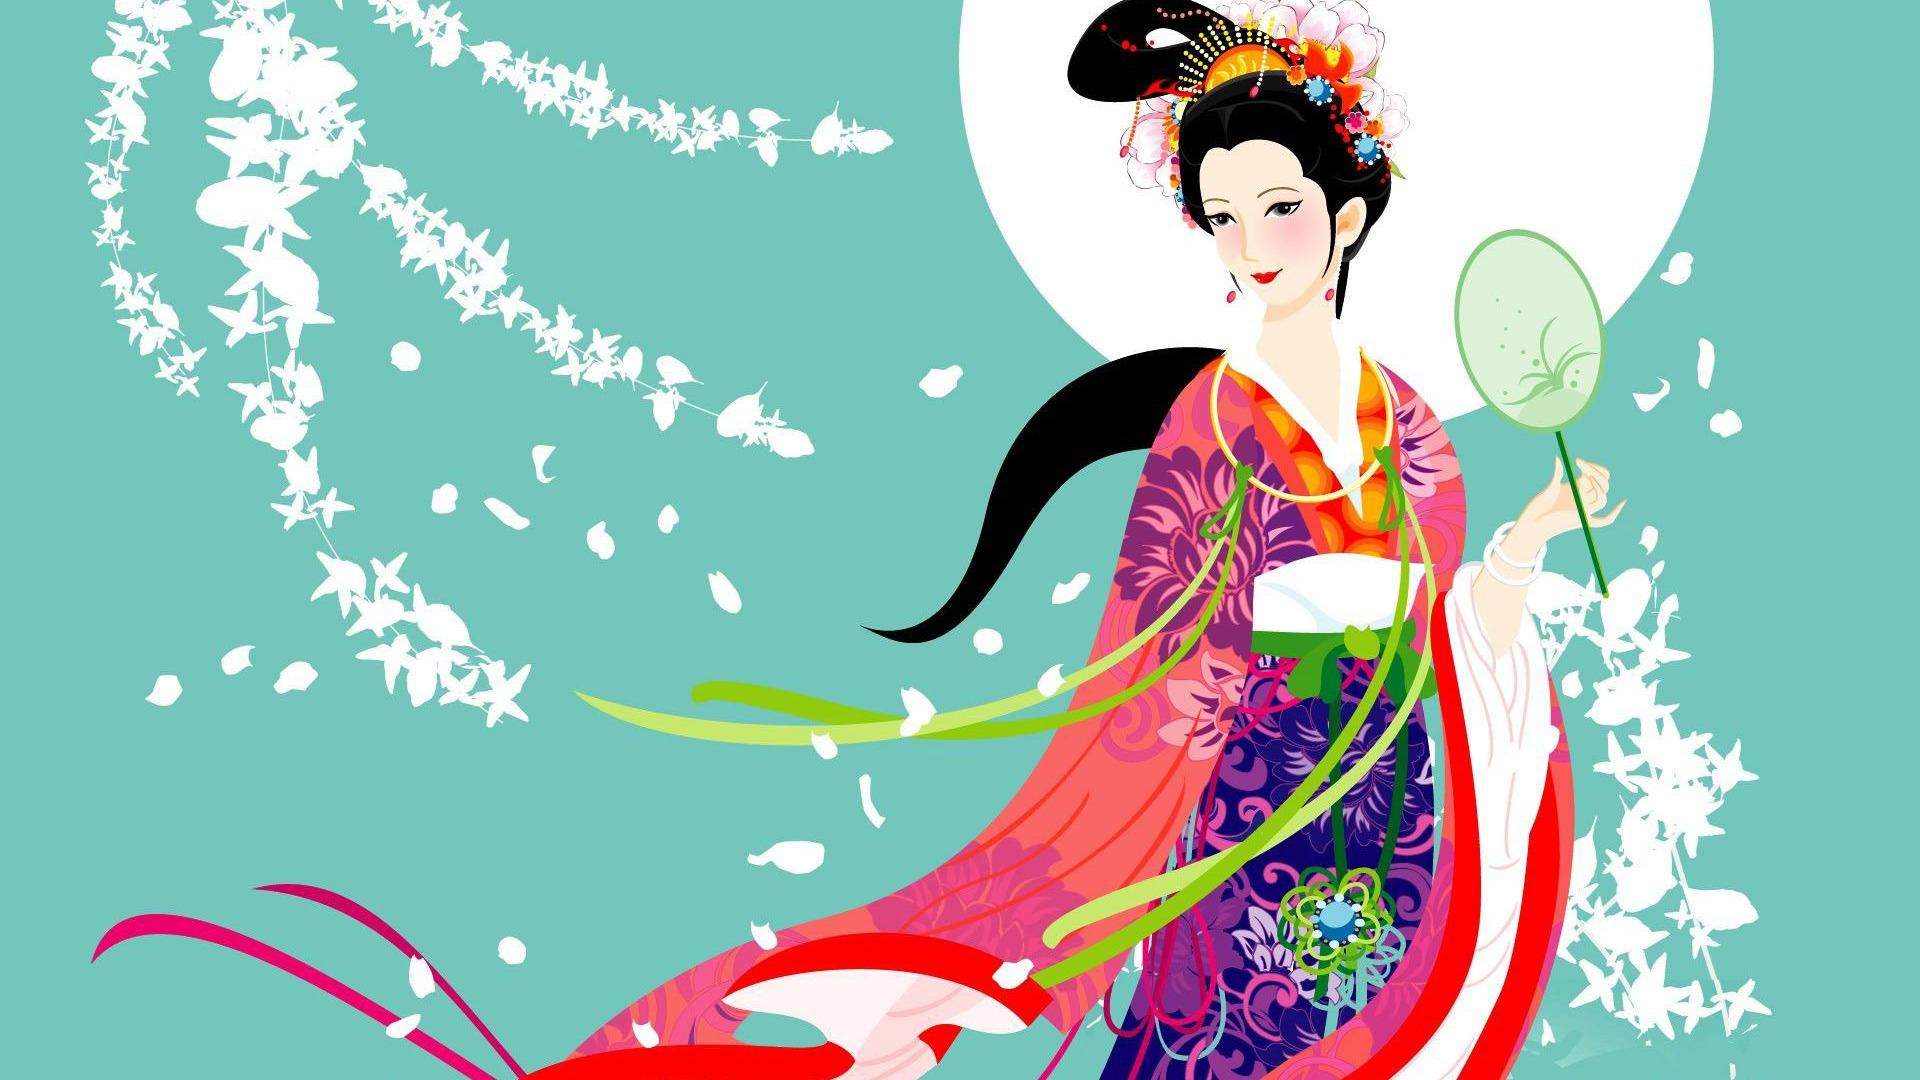 Geisha HD Wallpaper 1920x1080 Geisha HD Wallpaper 1920x1200 1920x1080